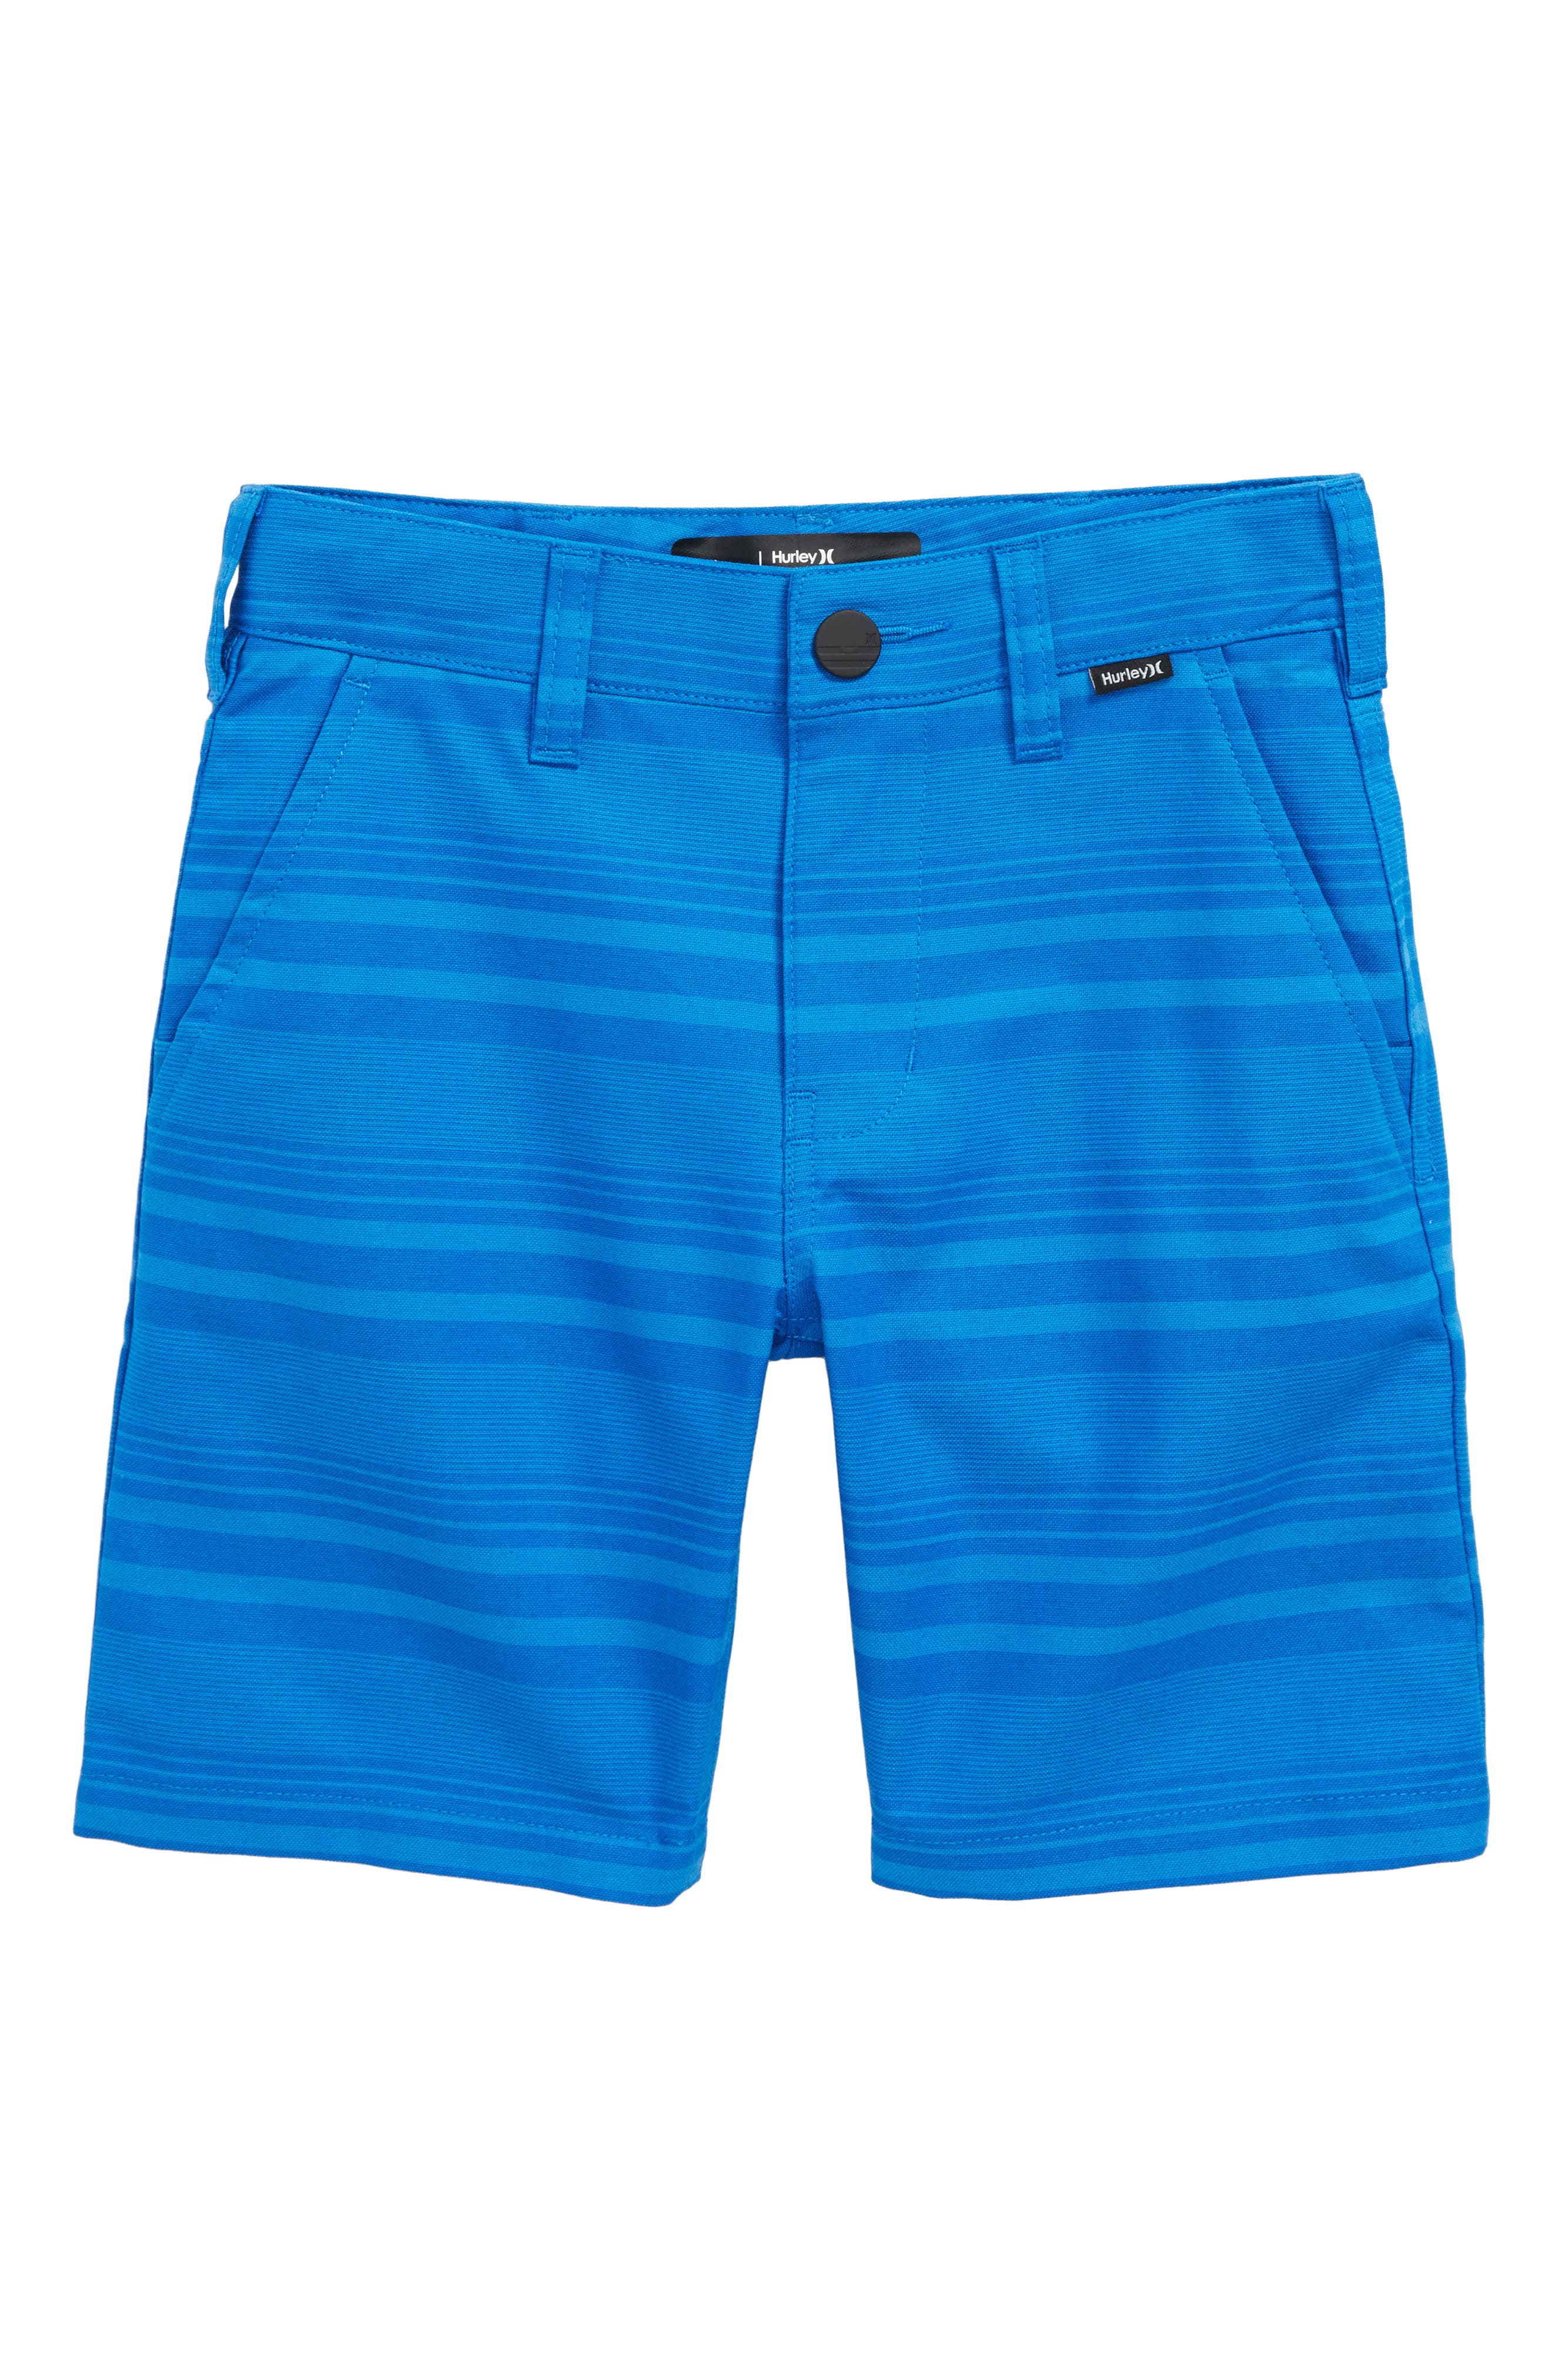 Jones Hybrid Shorts,                             Main thumbnail 1, color,                             Fountain Blue